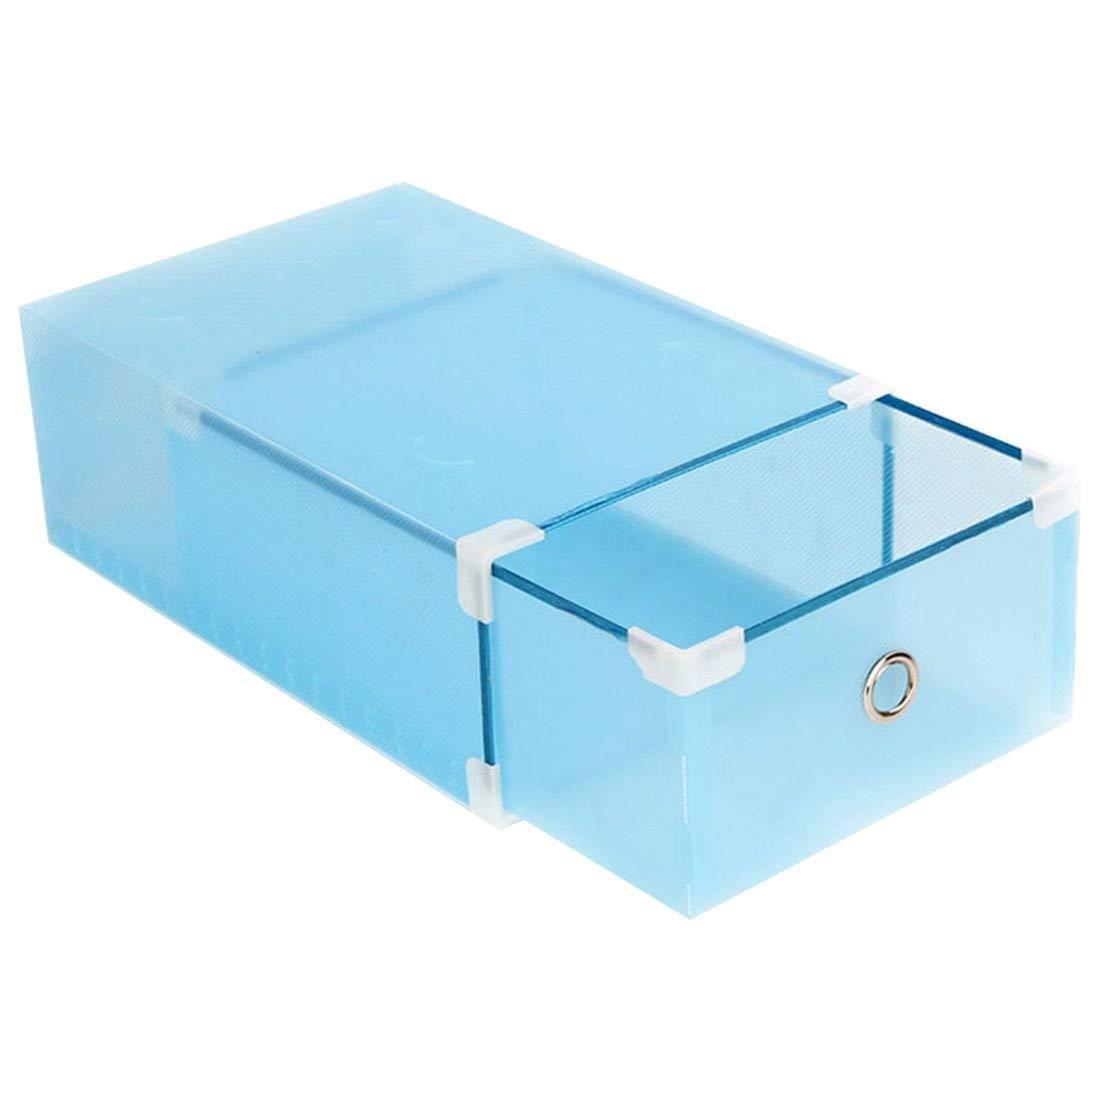 SODIAL(R) Shoes Box Transparent Plastic Drawer Type Metal Edging Thick Plastic Storage Box, Blue